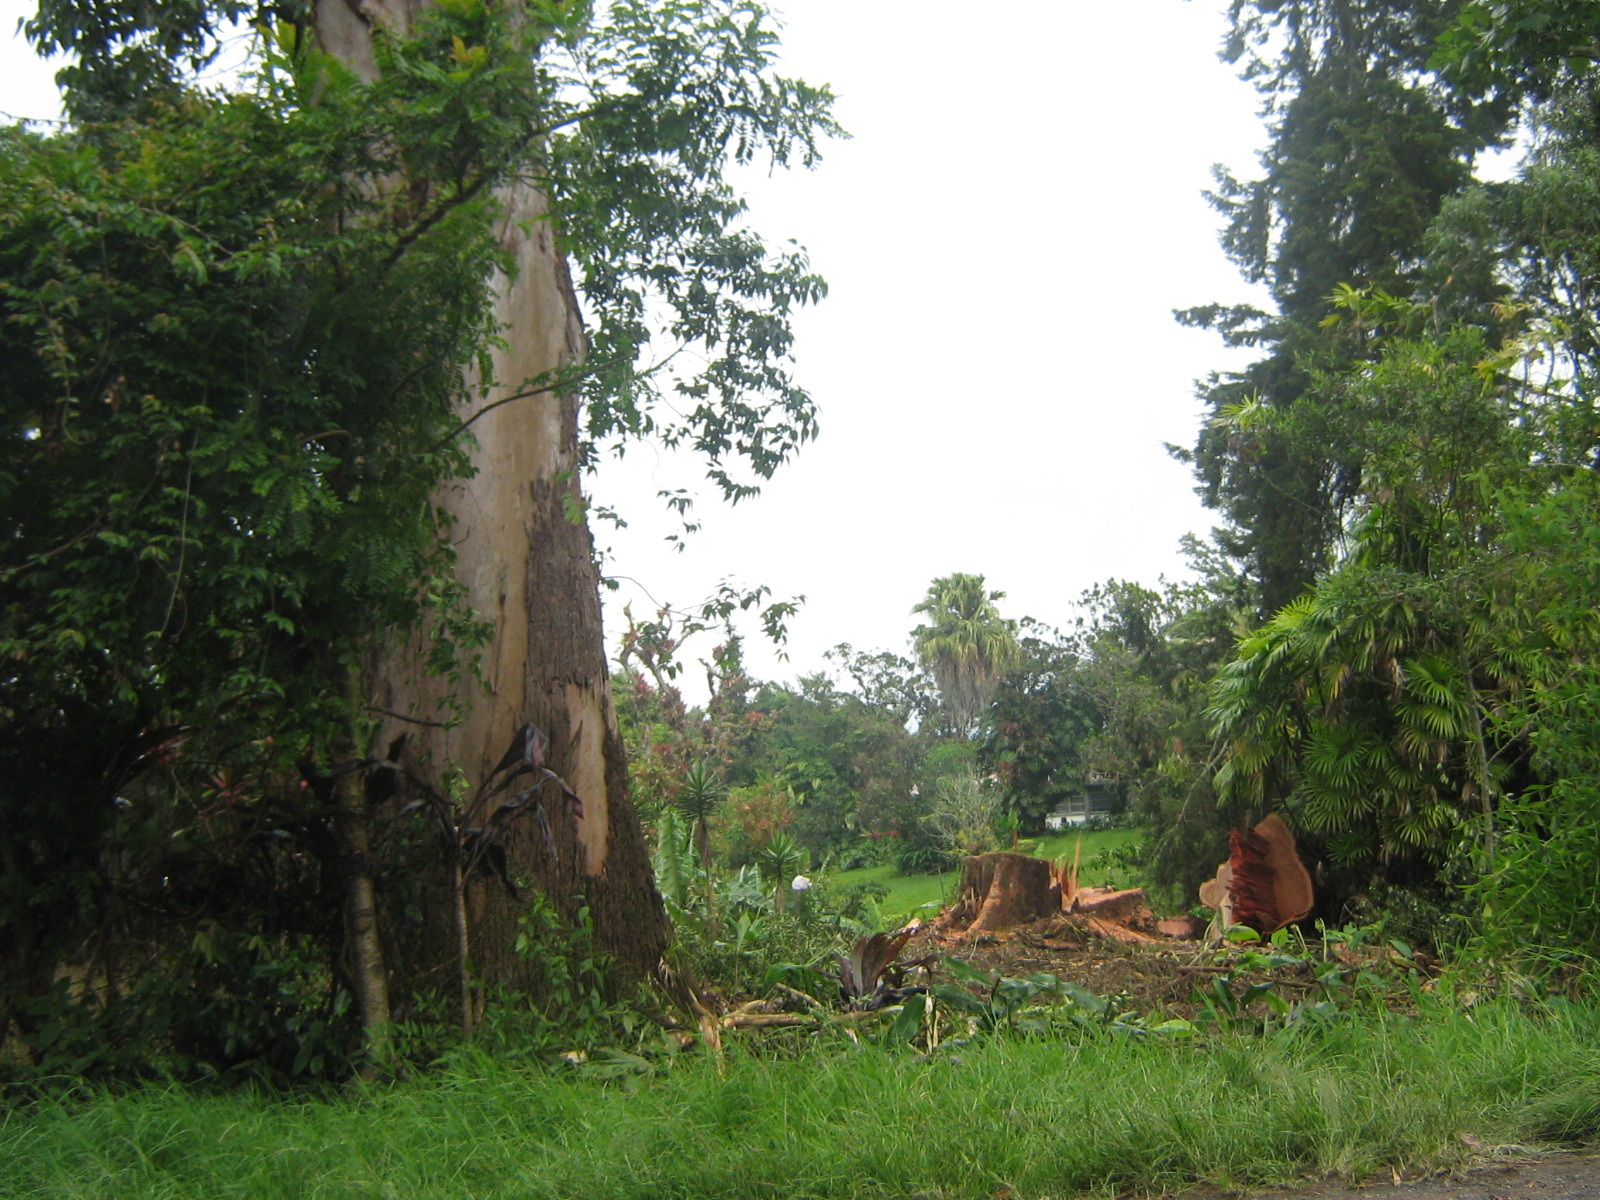 Tala-de-árboles-en-la-Omega-002.jpg